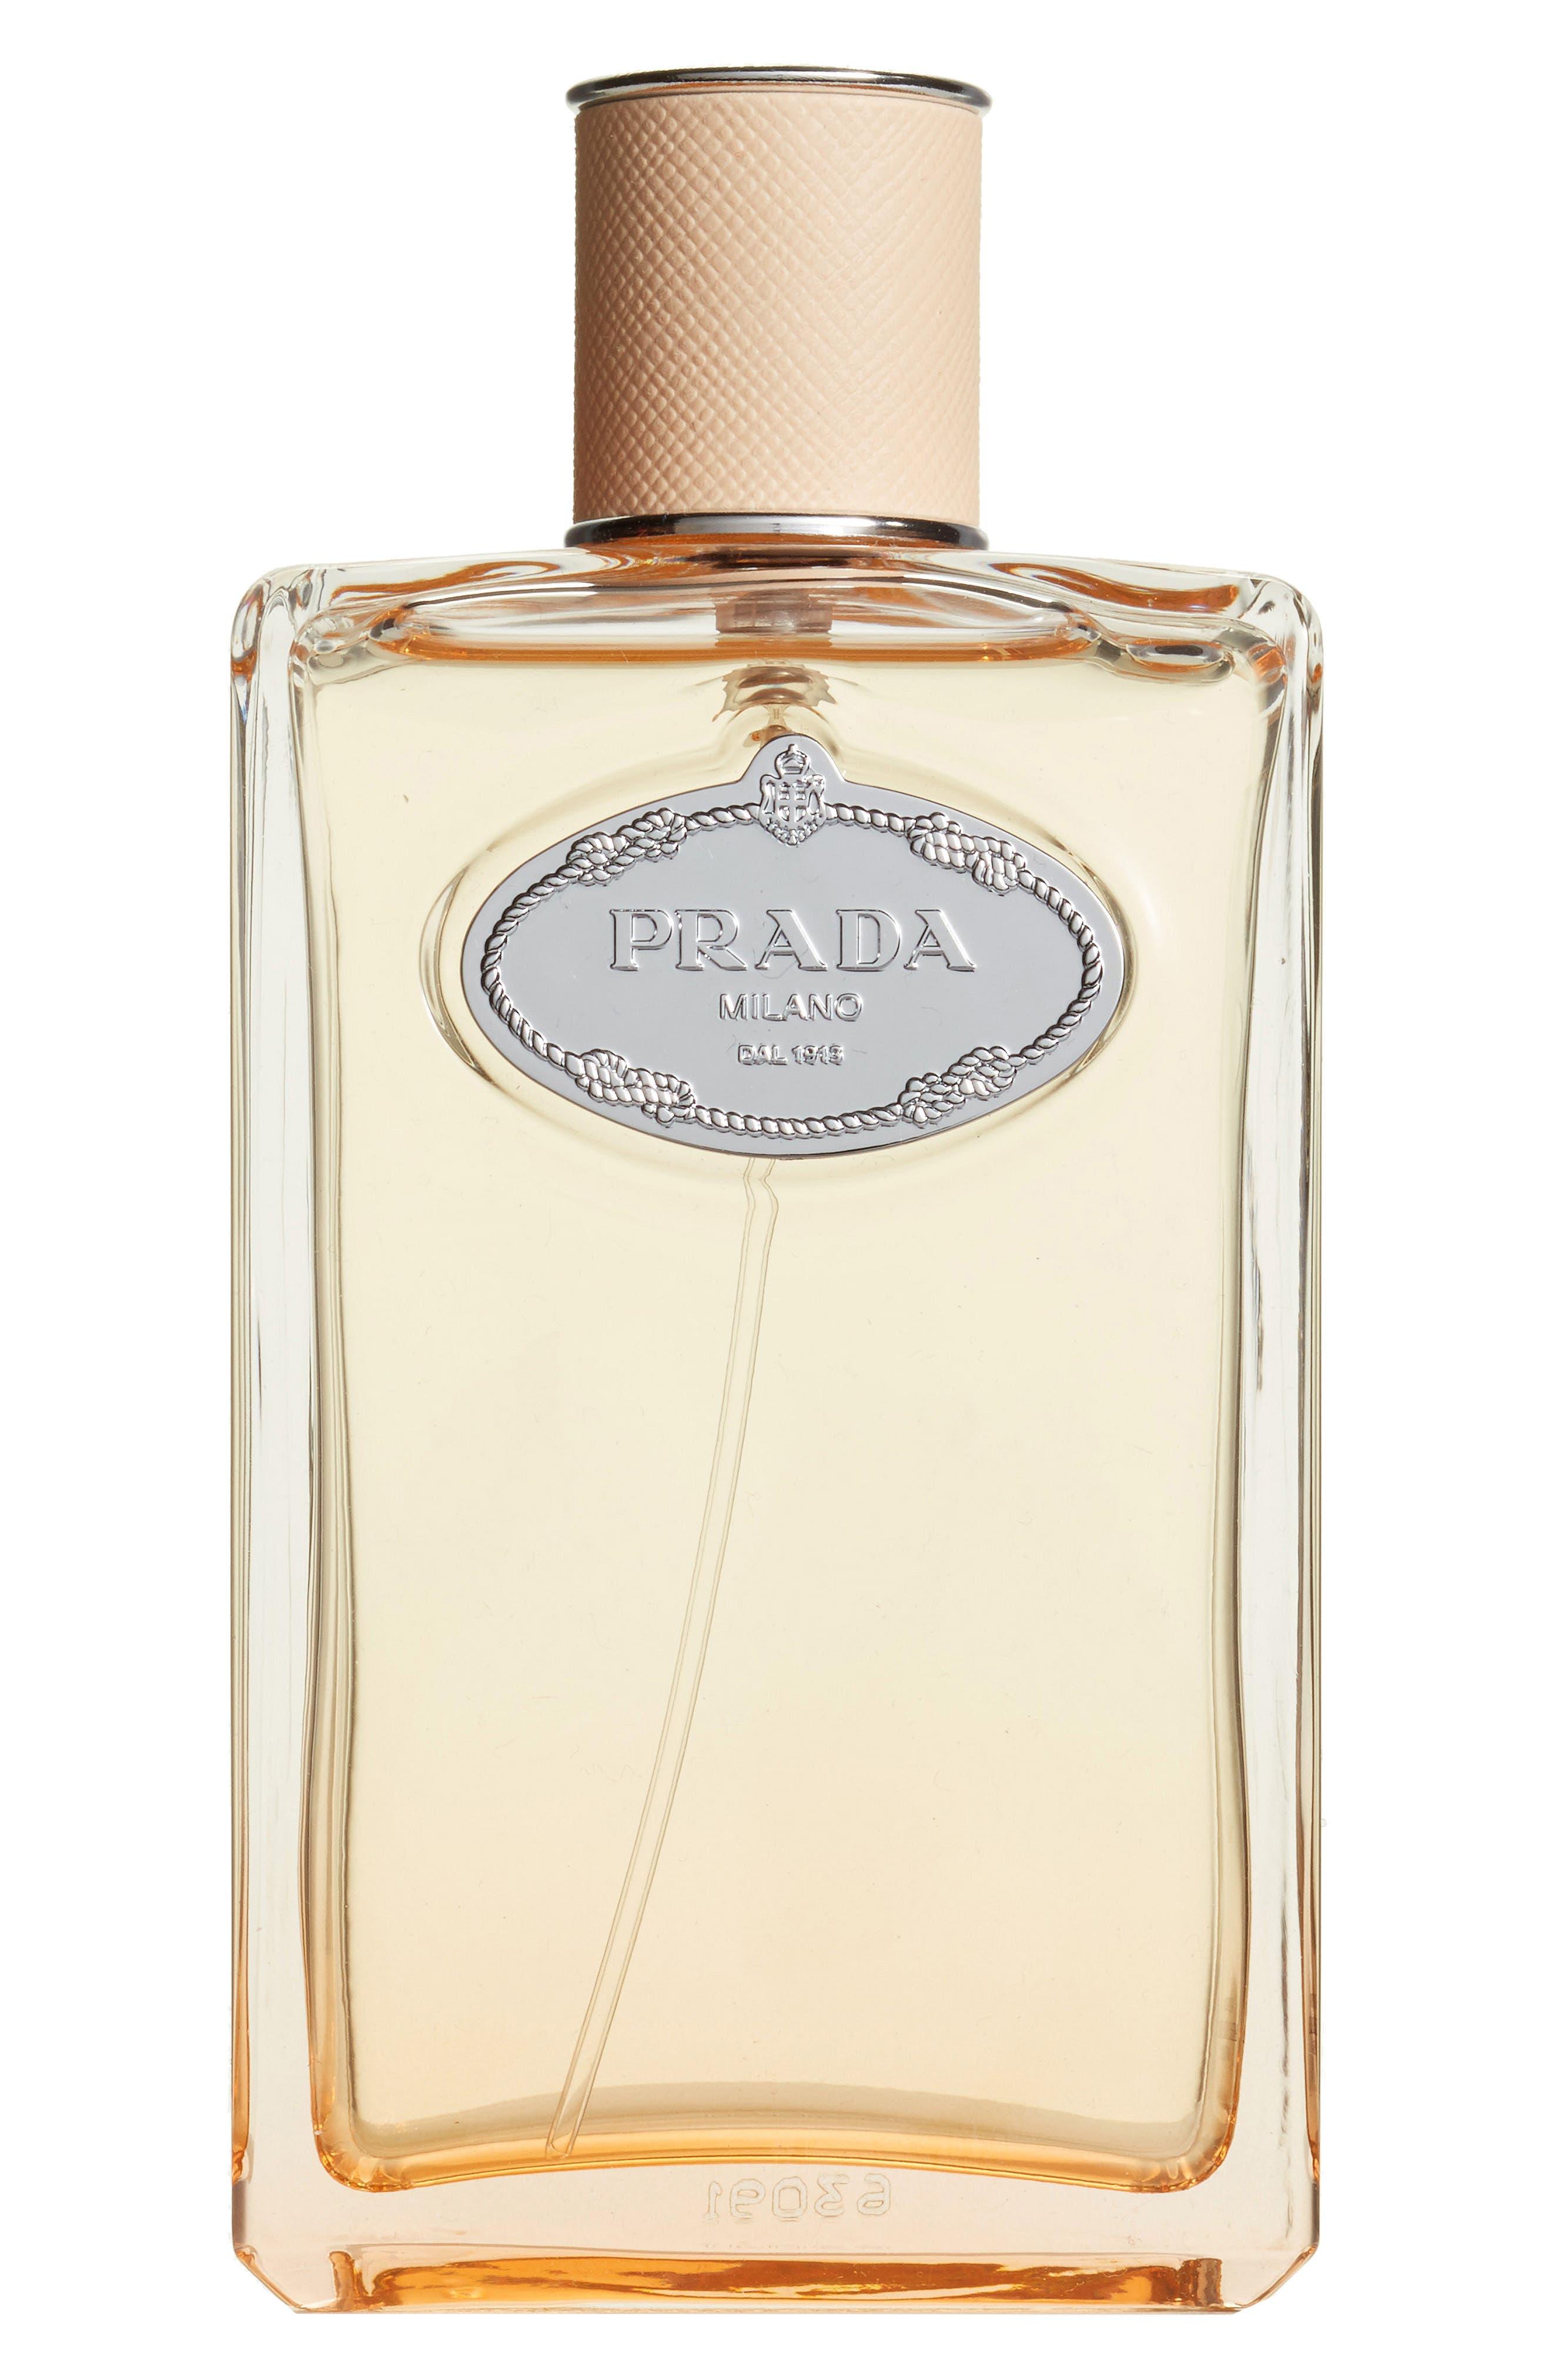 Main Image - Prada Les Infusions de Prada Fleur d'Oranger (Limited Edition)